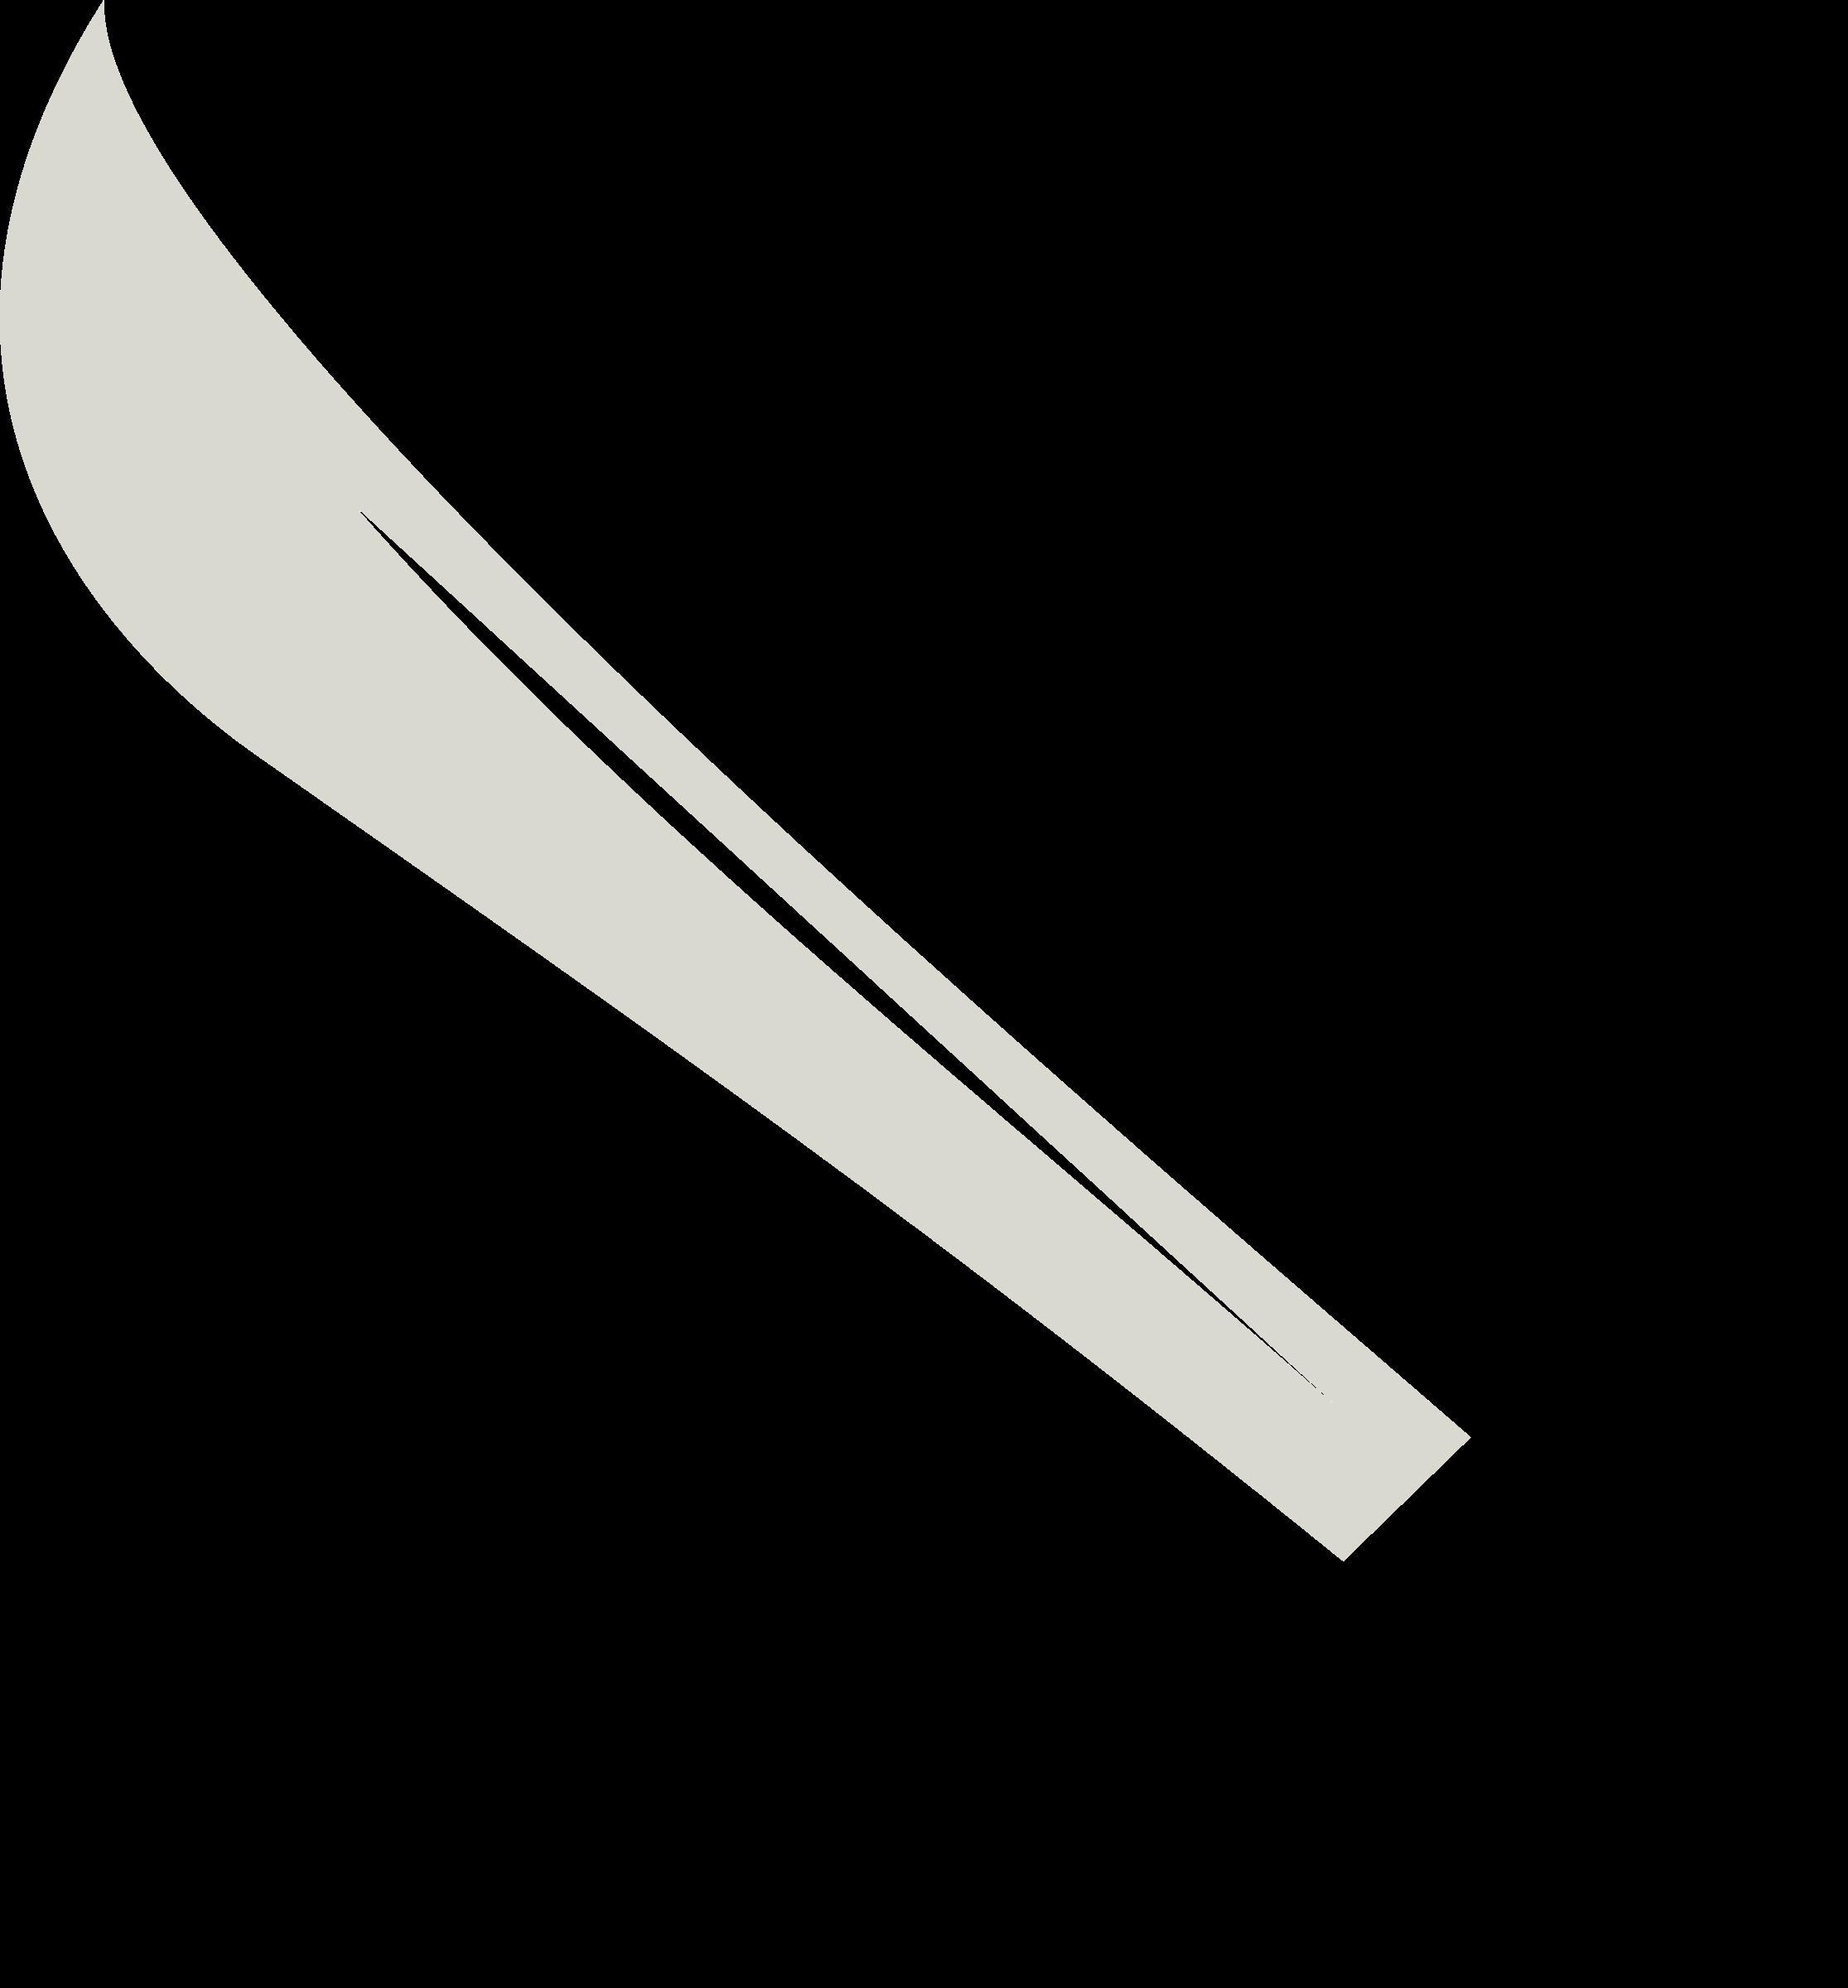 svg transparent download Machete free on dumielauxepices. Guns clipart knife